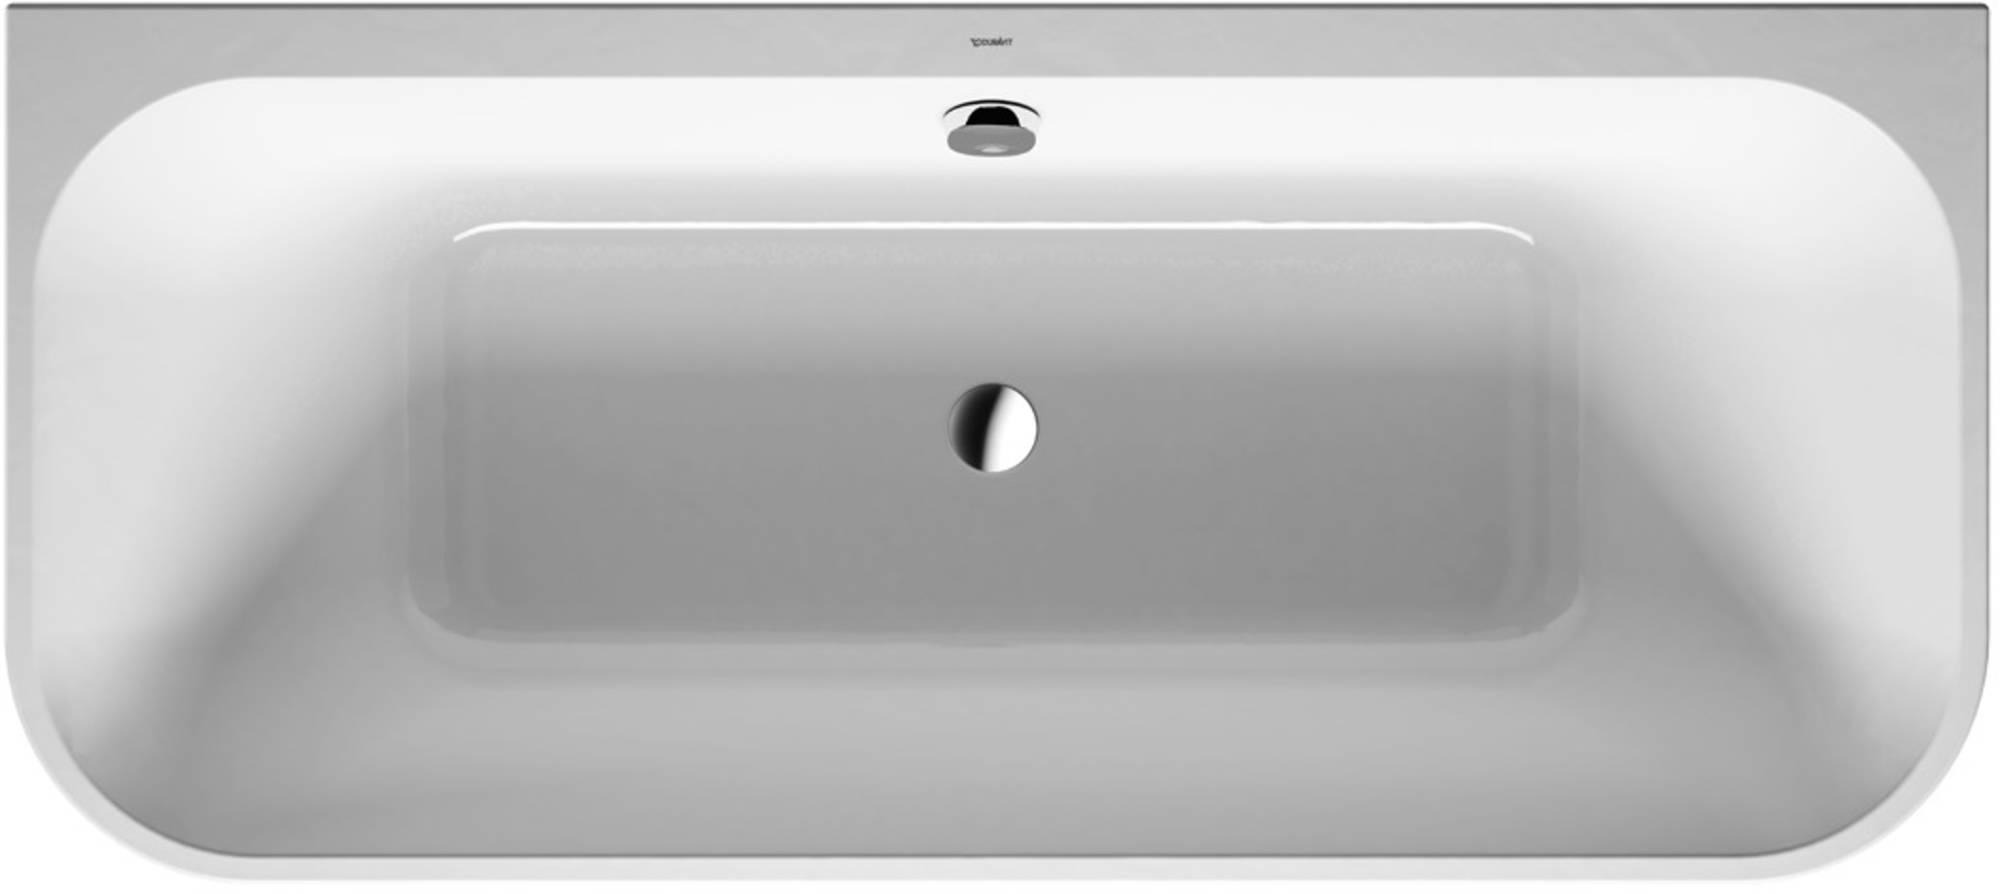 Duravit Happy D.2 Bad (zonder systeem) Rechthoek 180x80 cm Wit